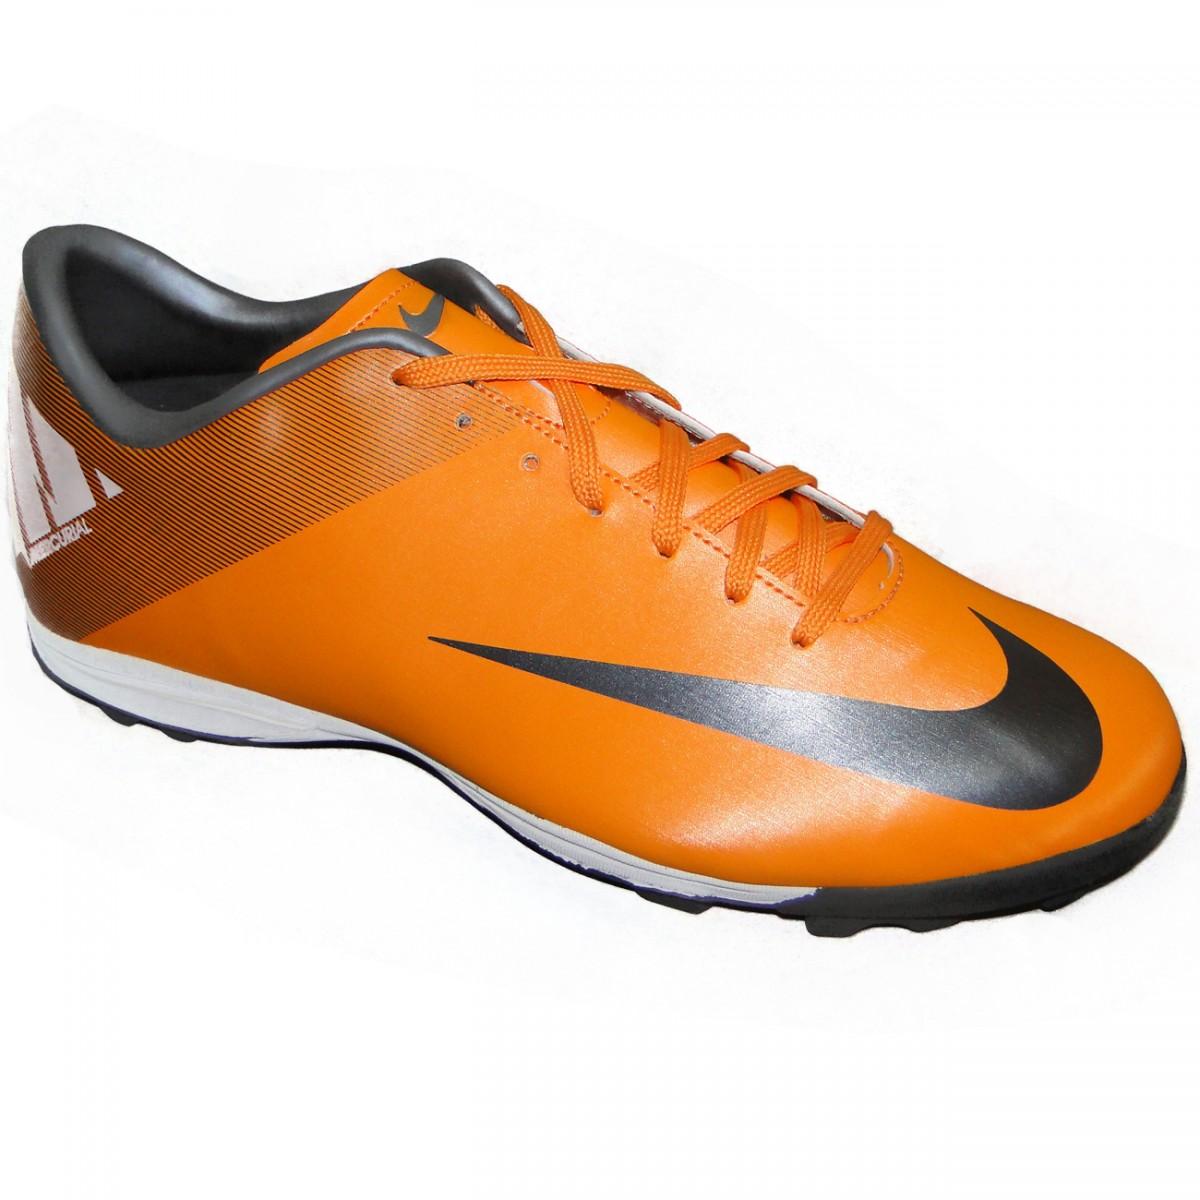 08d2b10c21 Chuteira Society Nike Mercurial Victory Ii 9827 - LARANJA PRETO - Chuteira  Nike